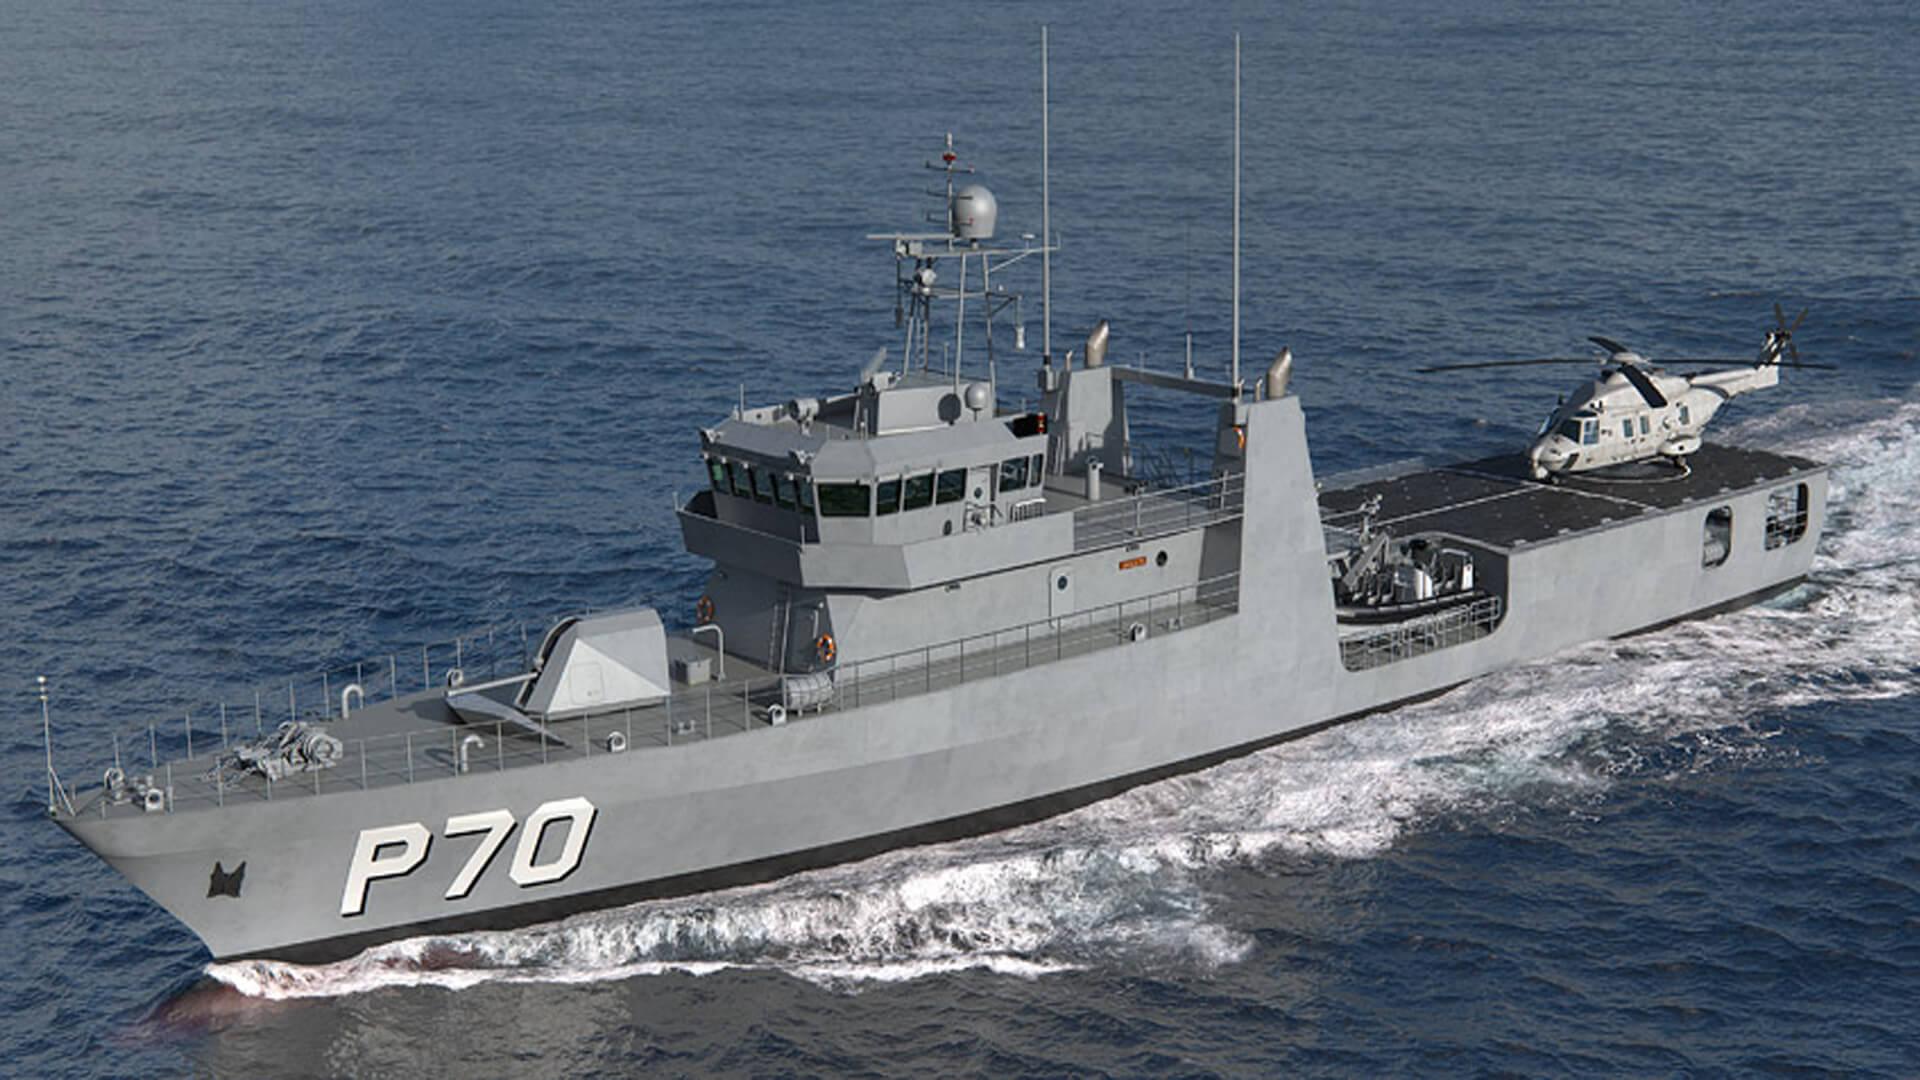 images/vessels/01-patrol-craft/01-series-opv/01-rolls-royce-skadi-70-opv/01.jpg